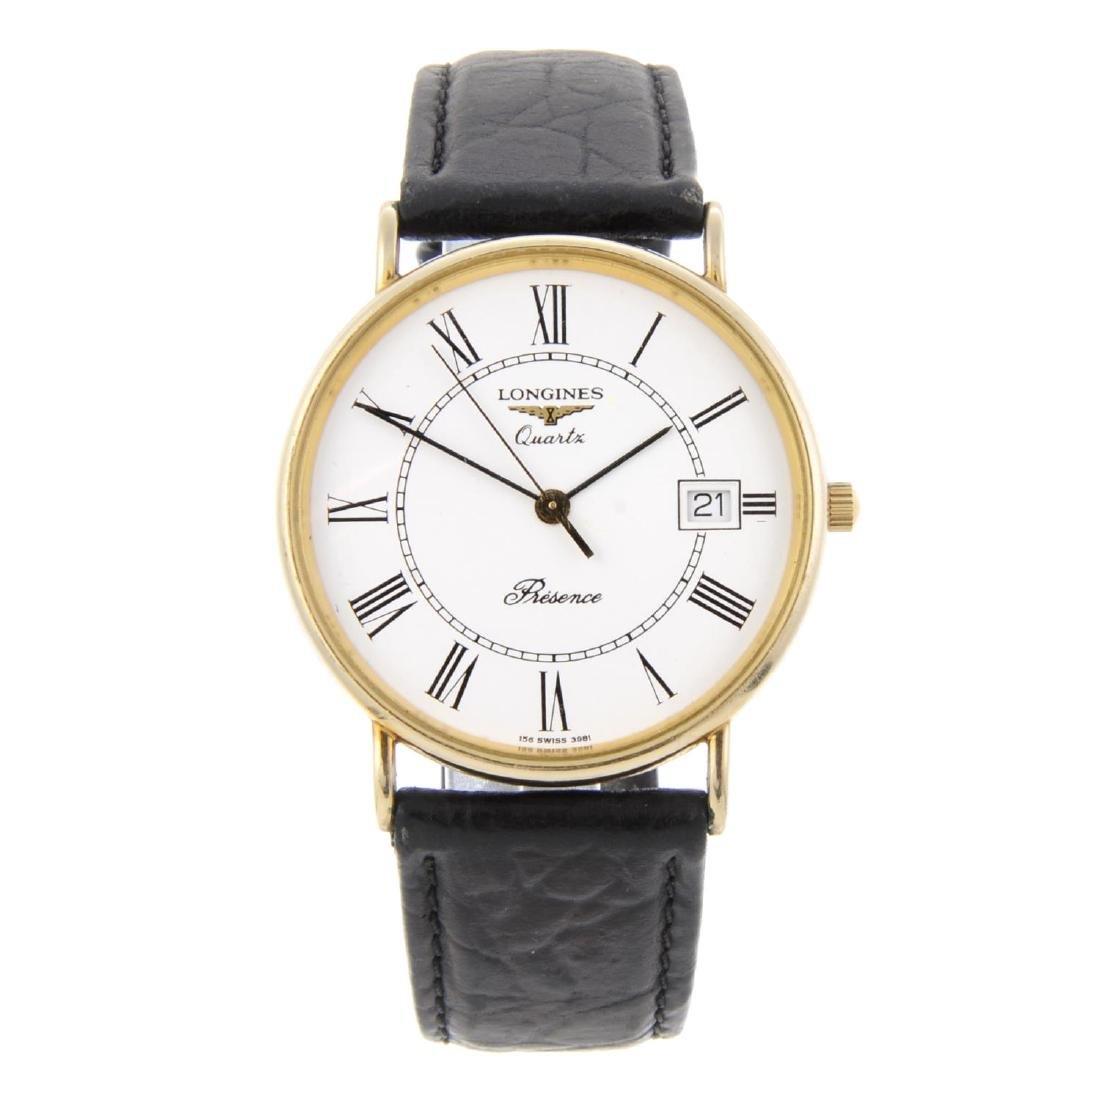 LONGINES - a gentleman's Presence wrist watch. 9ct